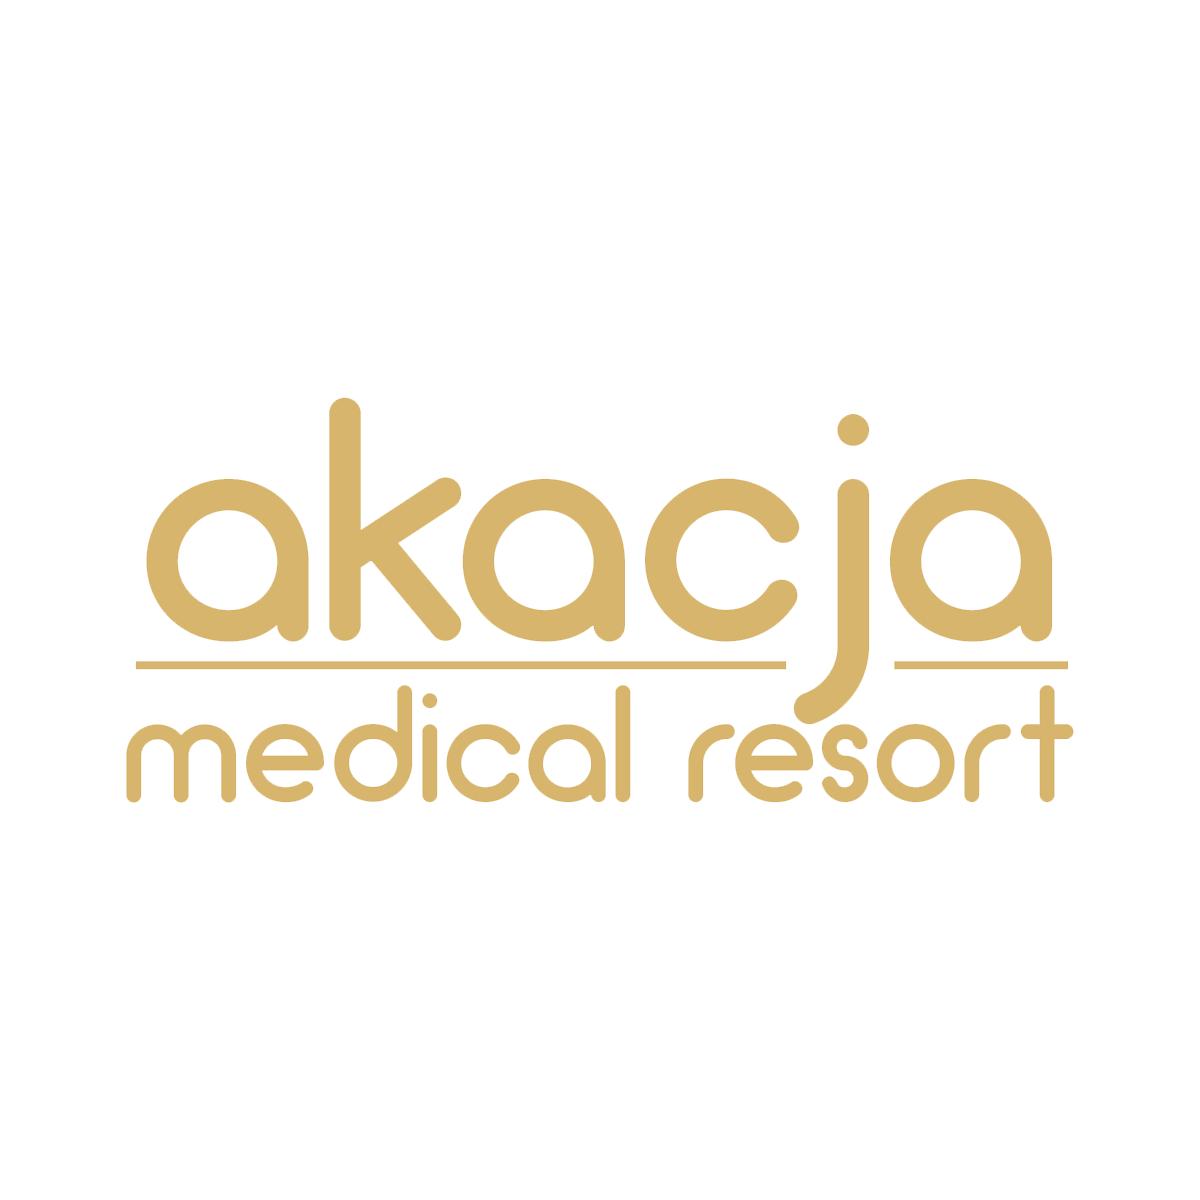 Akacja Medical Resort logo